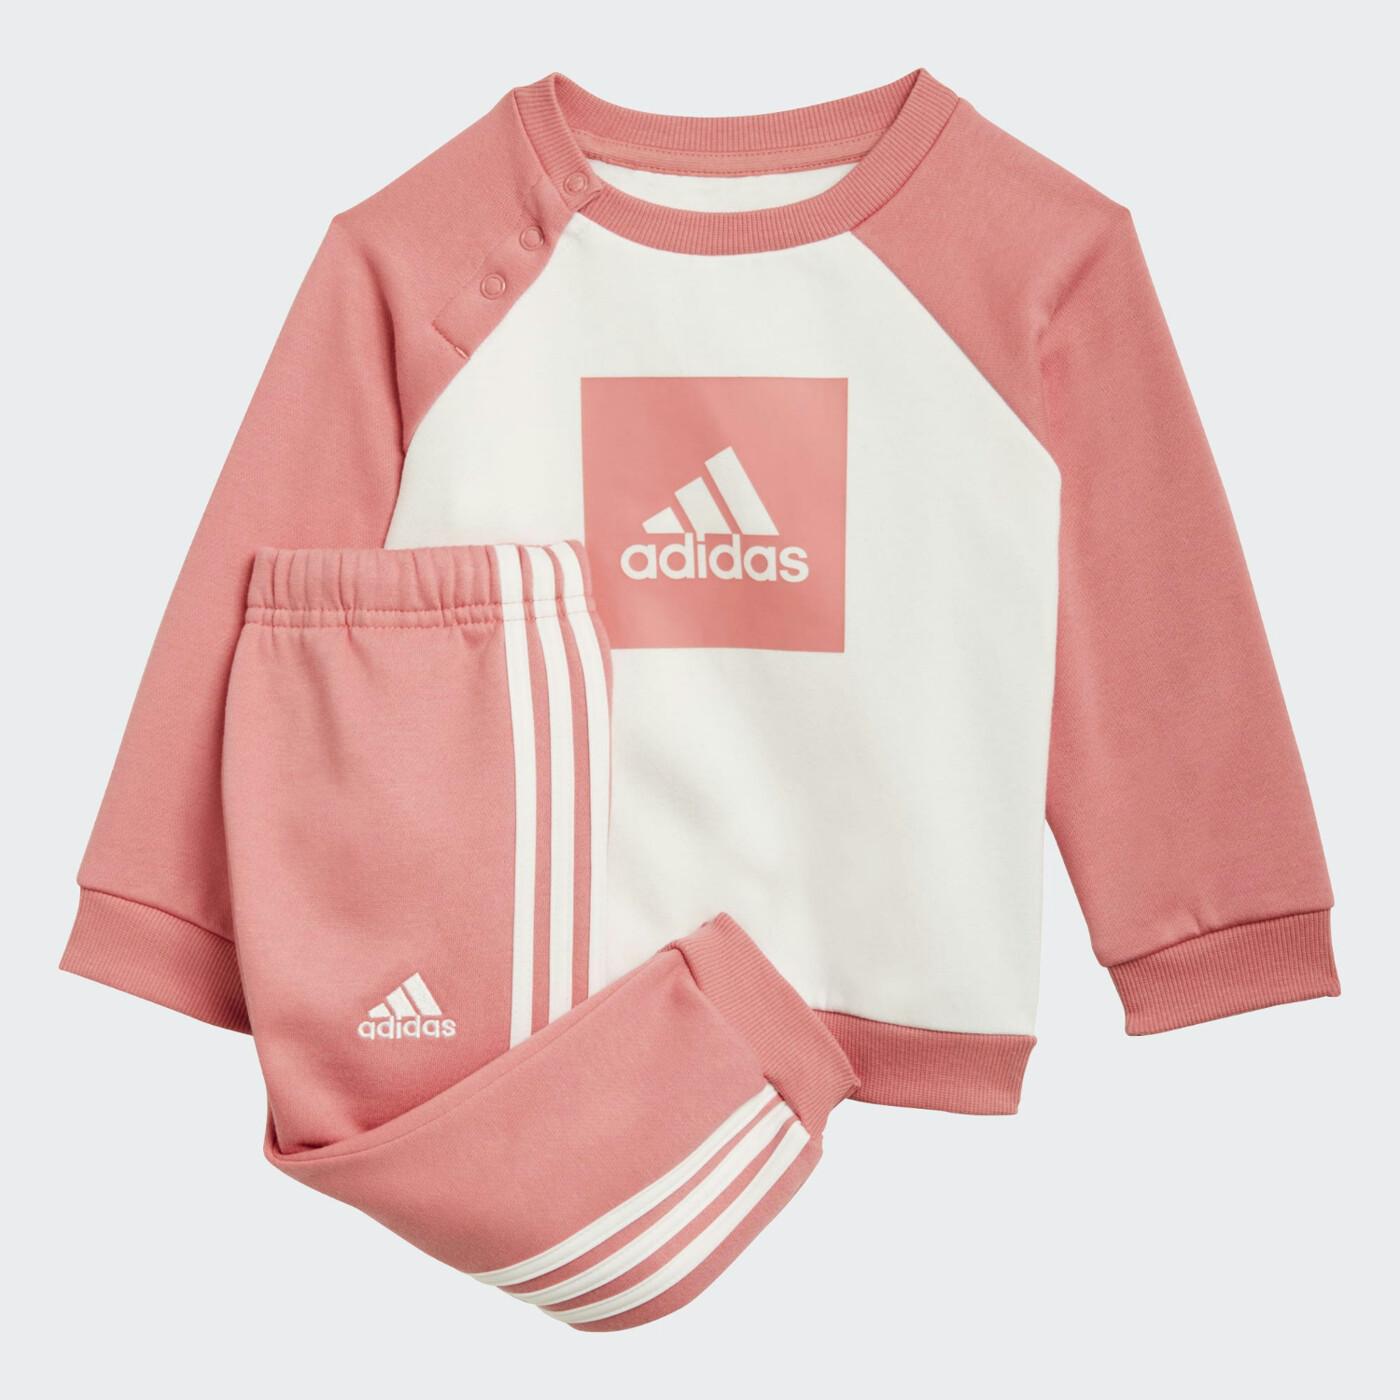 Jogger I 3SLOGO JOG FL Adidas - Kinder